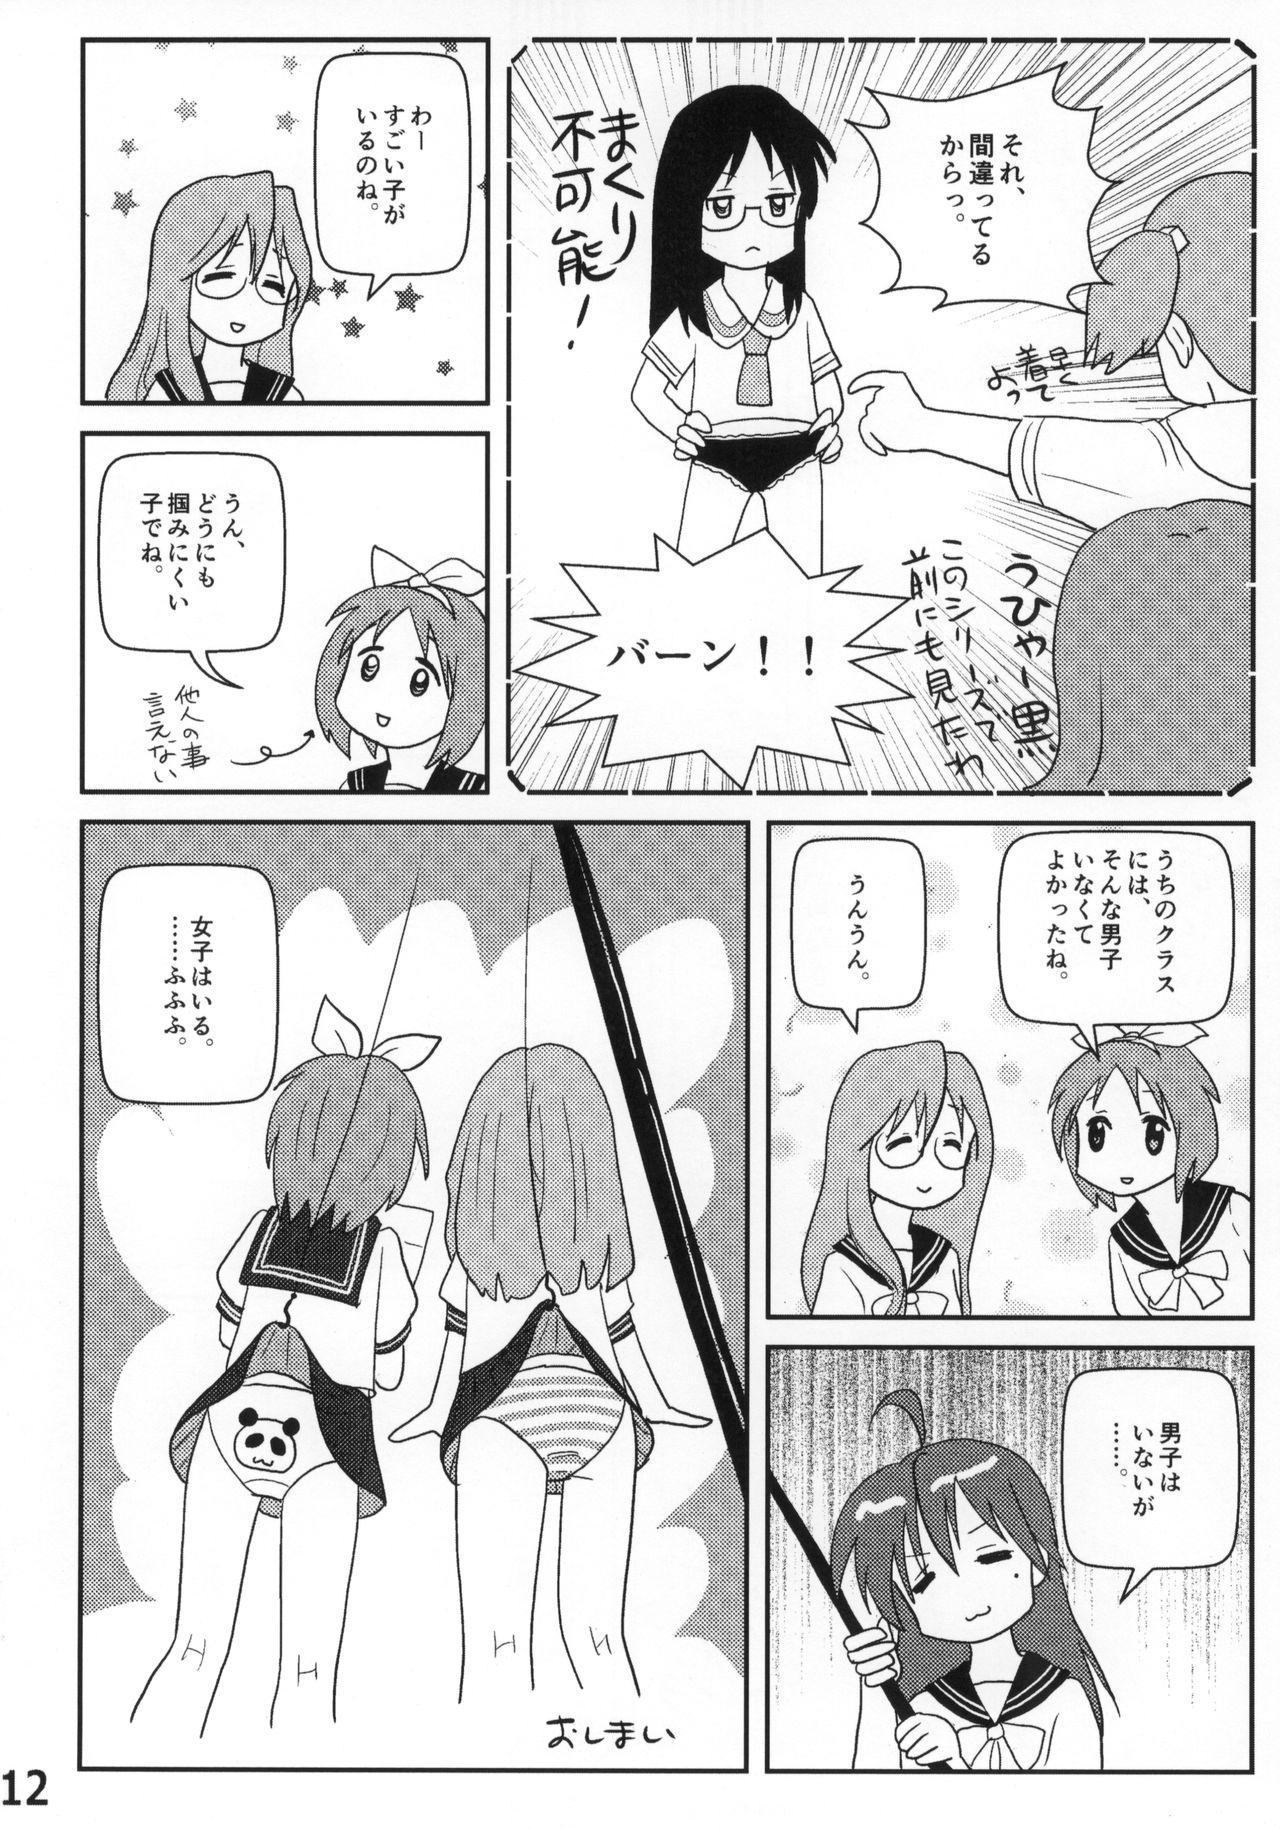 Lucky-jou Pantsu Hunter Vol. 2 10